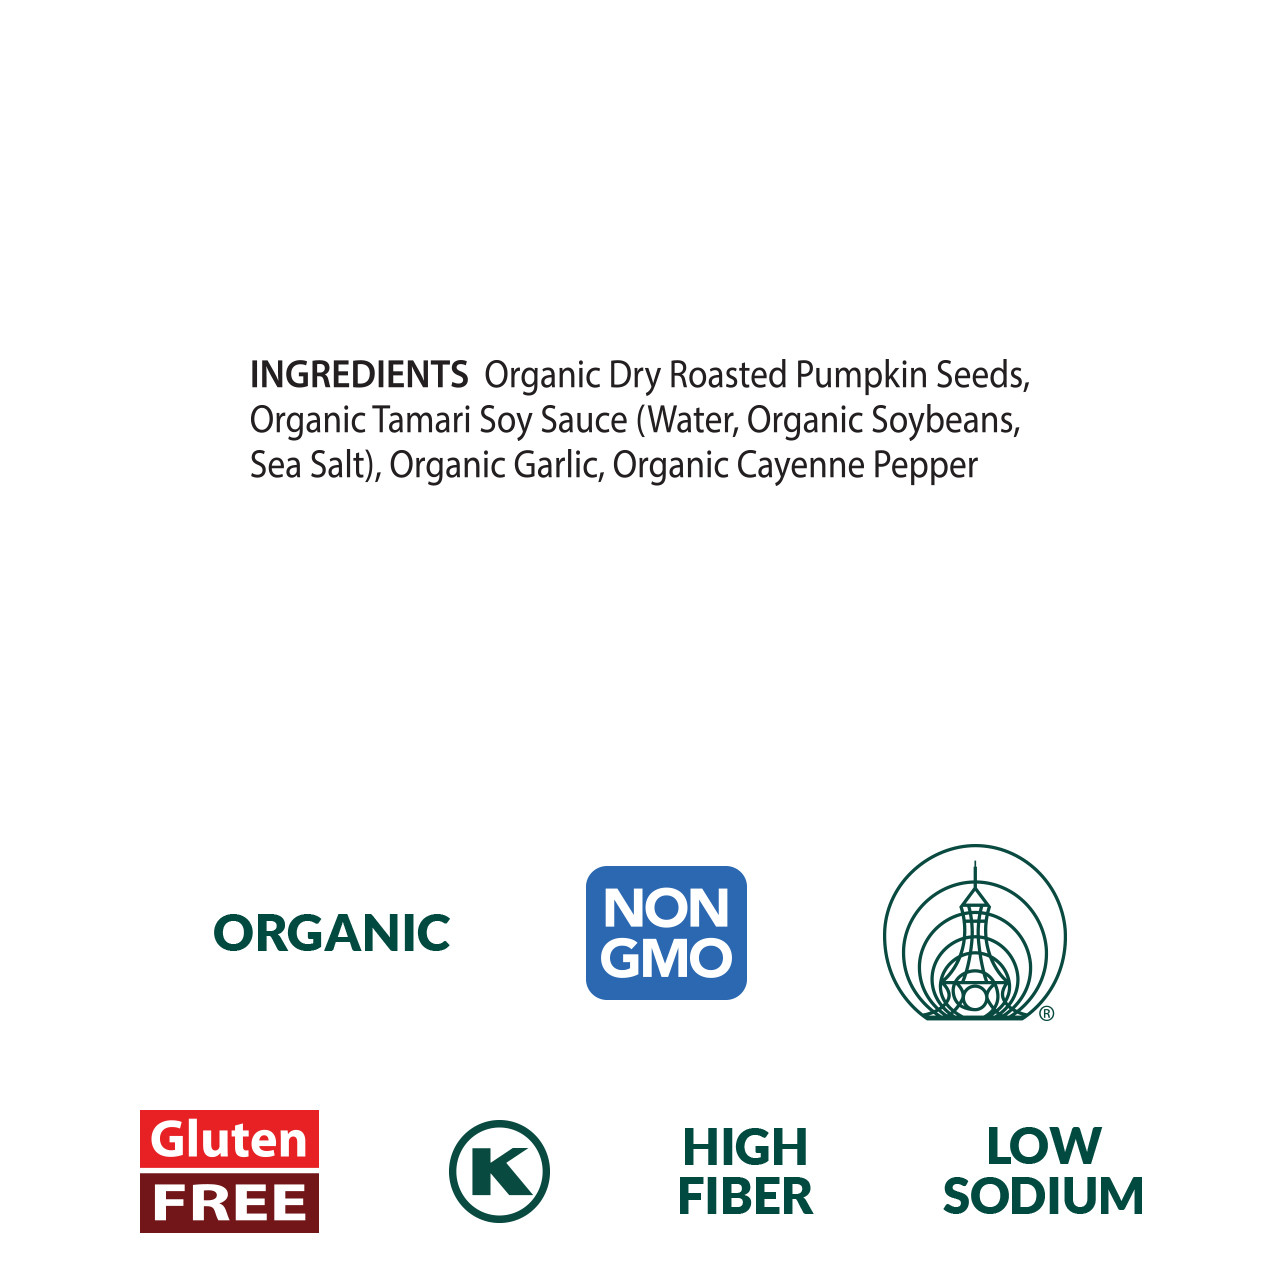 Spicy Pumpkin Seeds, Organic - 1 lb